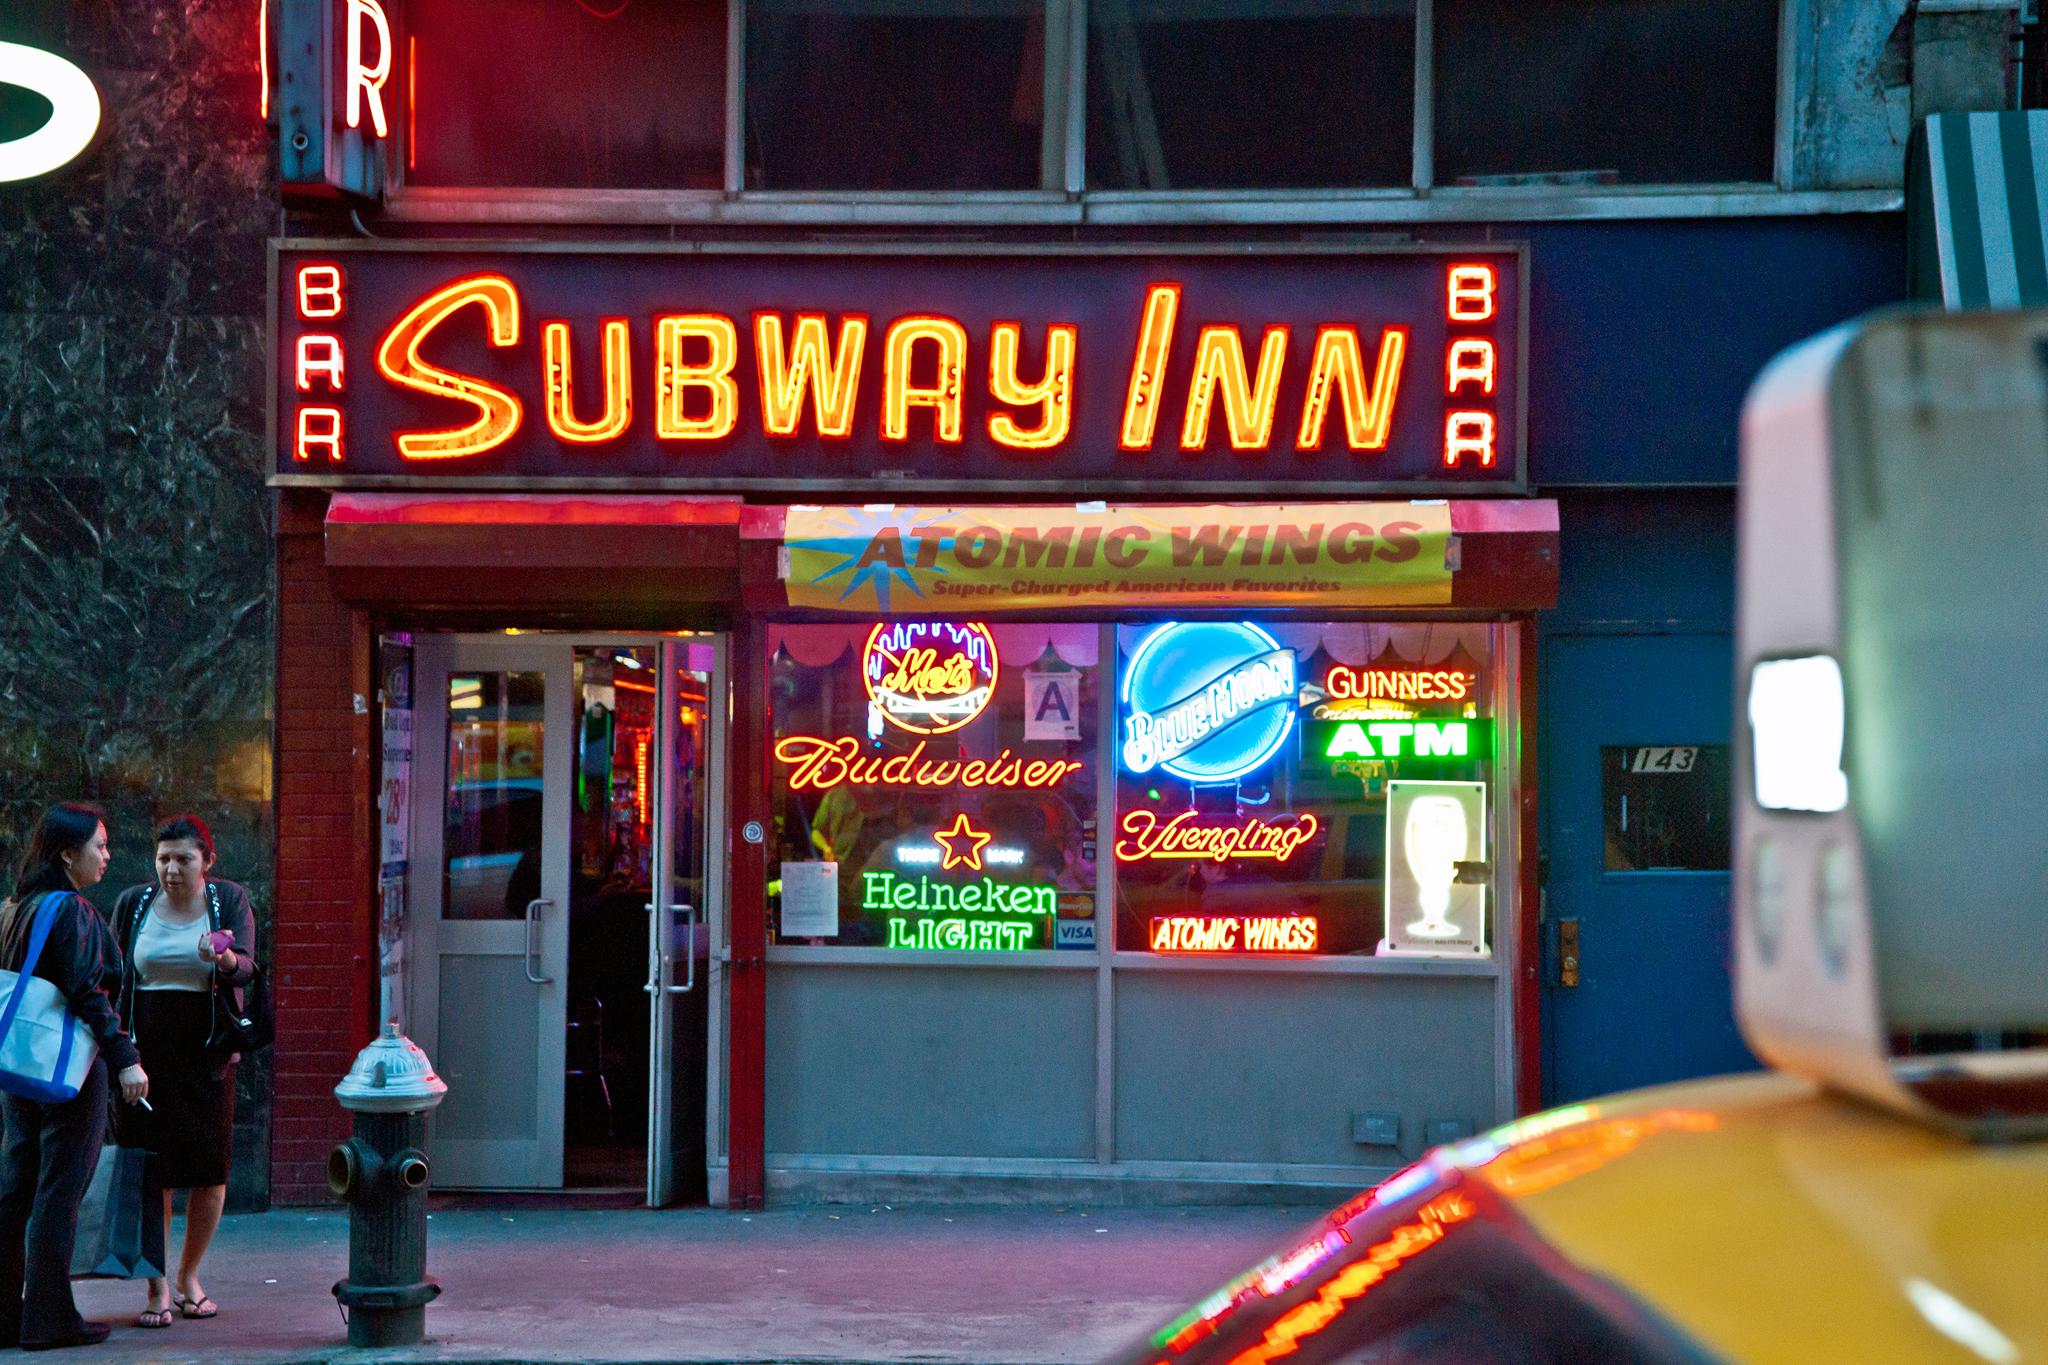 Subway Inn